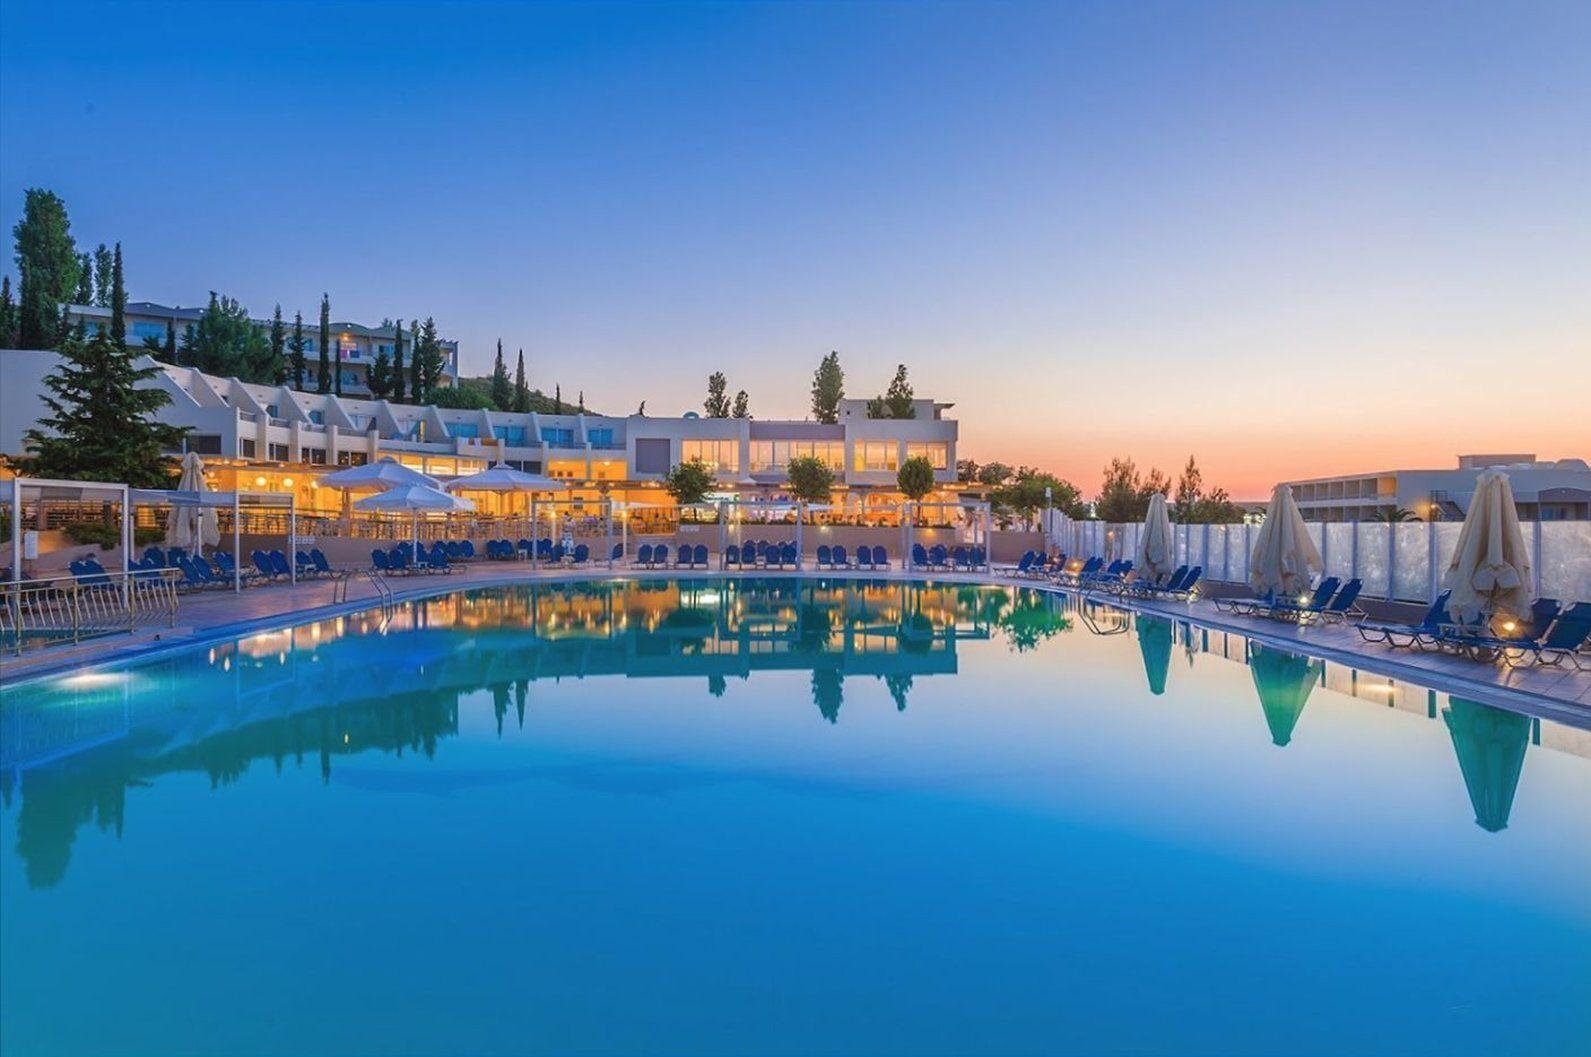 Kipriotis Aqualand - All Inclusive